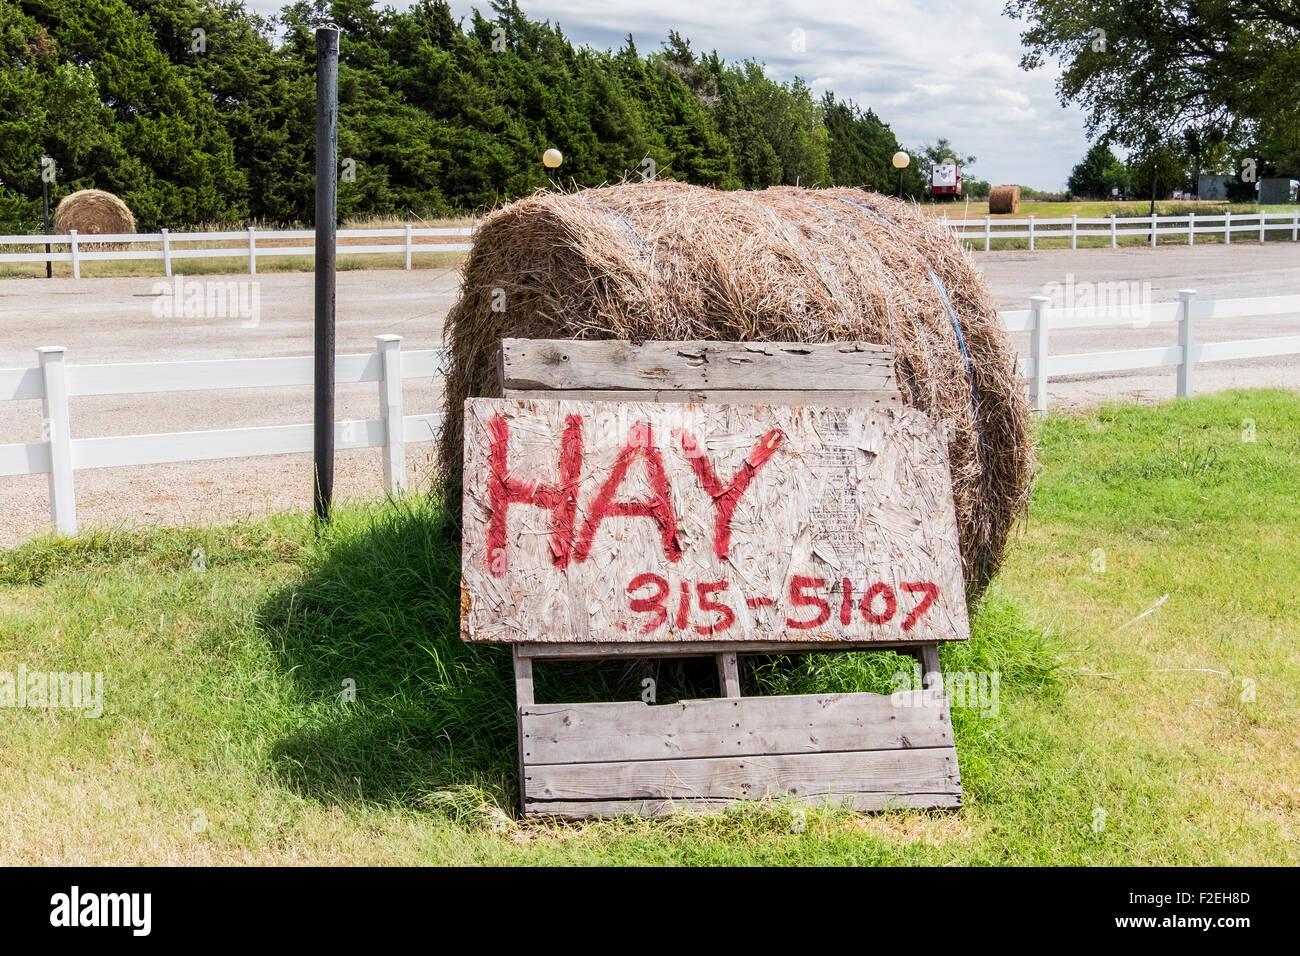 hay-for-sale-alongside-a-rural-road-in-o